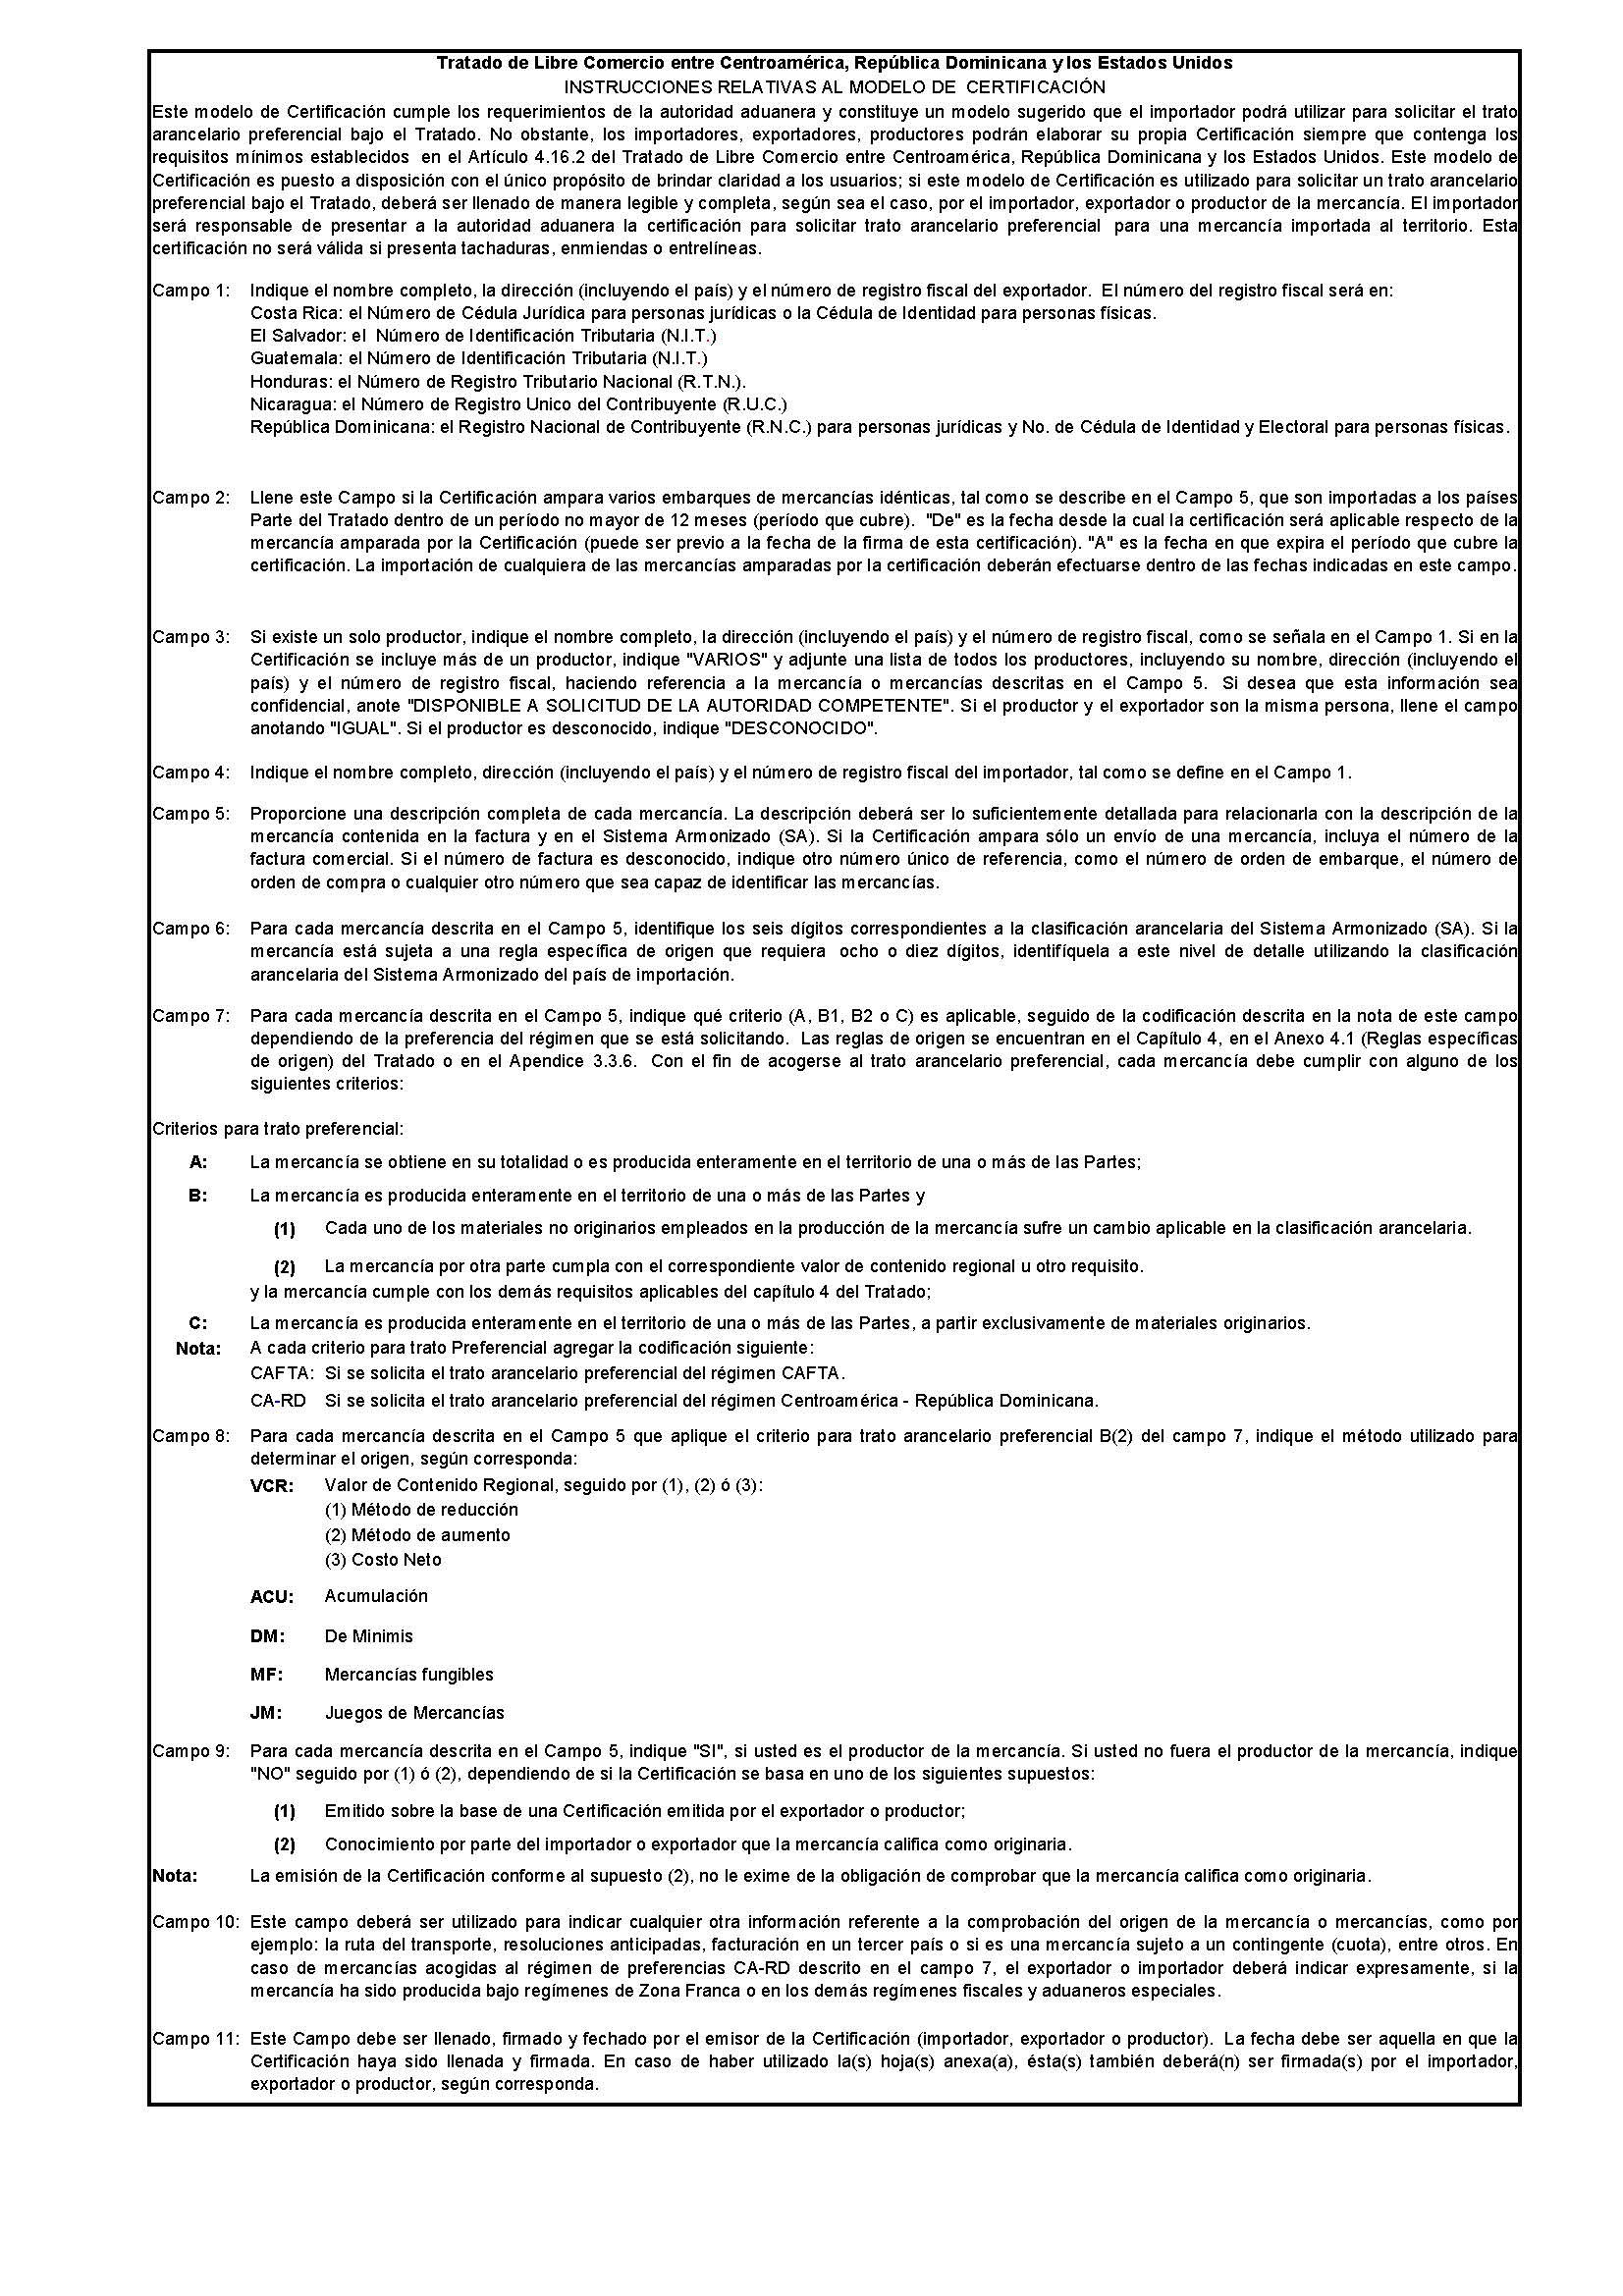 721 Cafta Dr Certificate Of Origin Privacy Shield